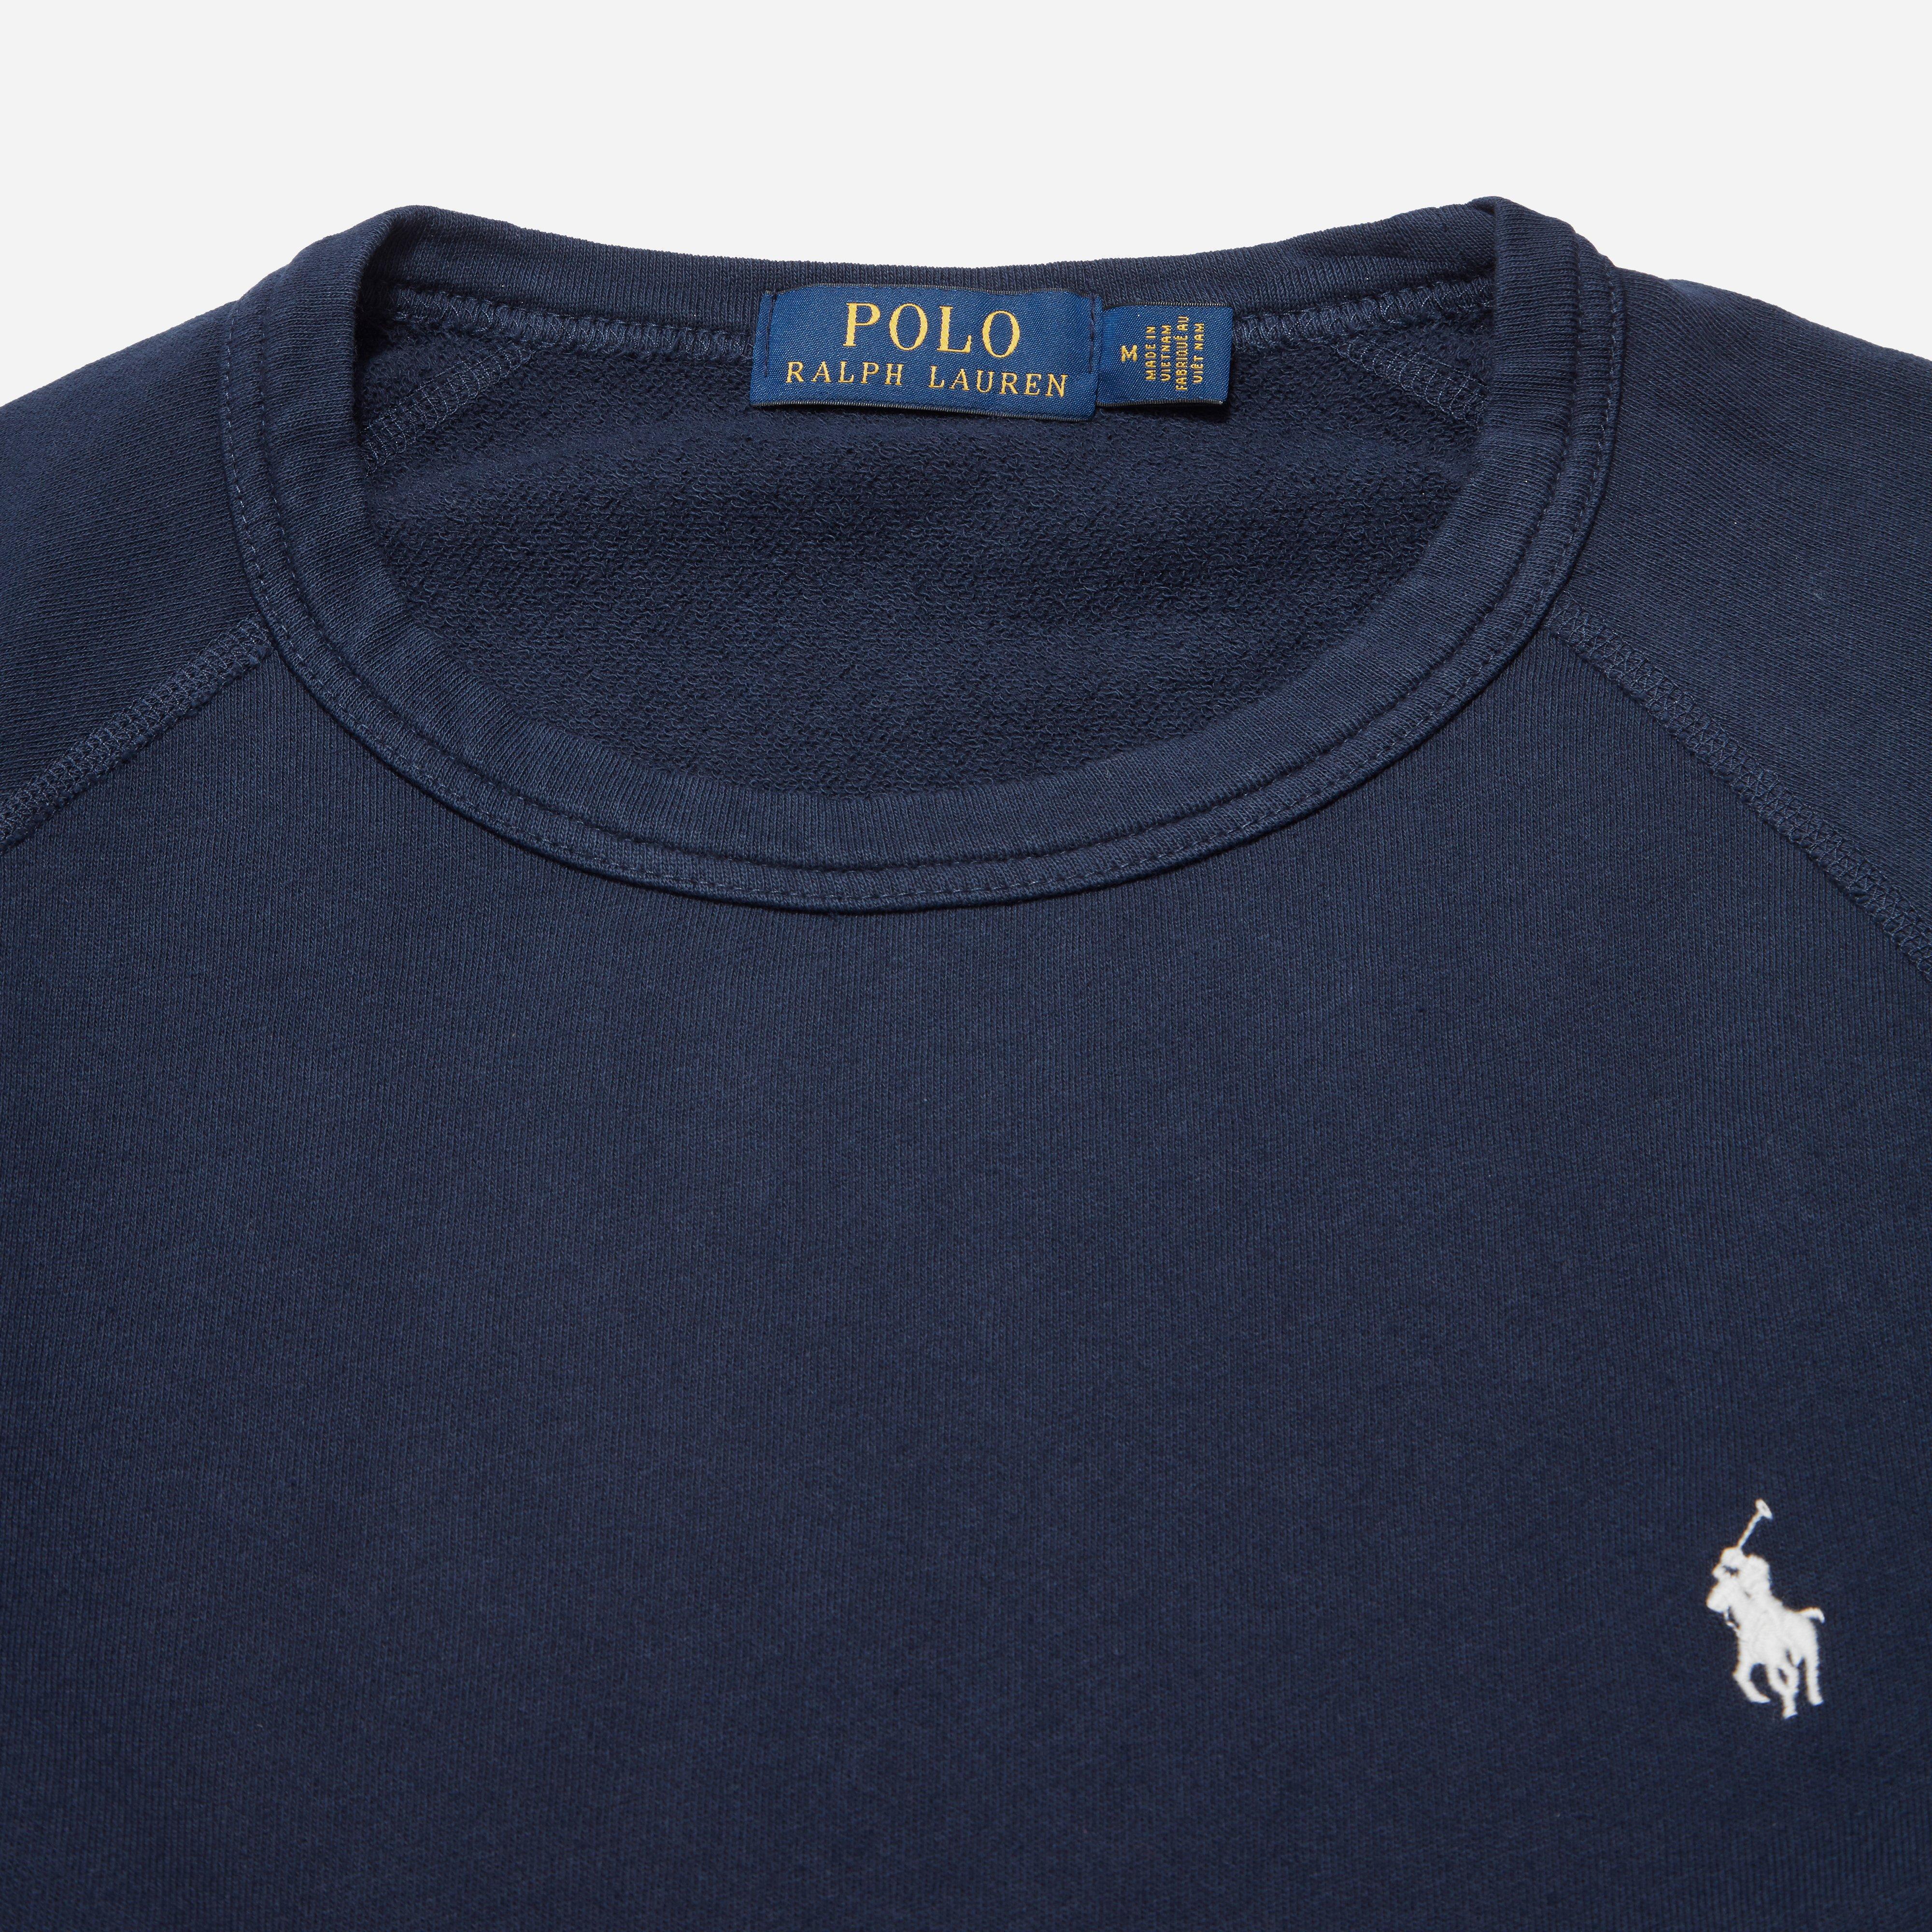 Polo Shirts VietnamToffee Art Made Ralph Lauren In EDHIW9Y2e